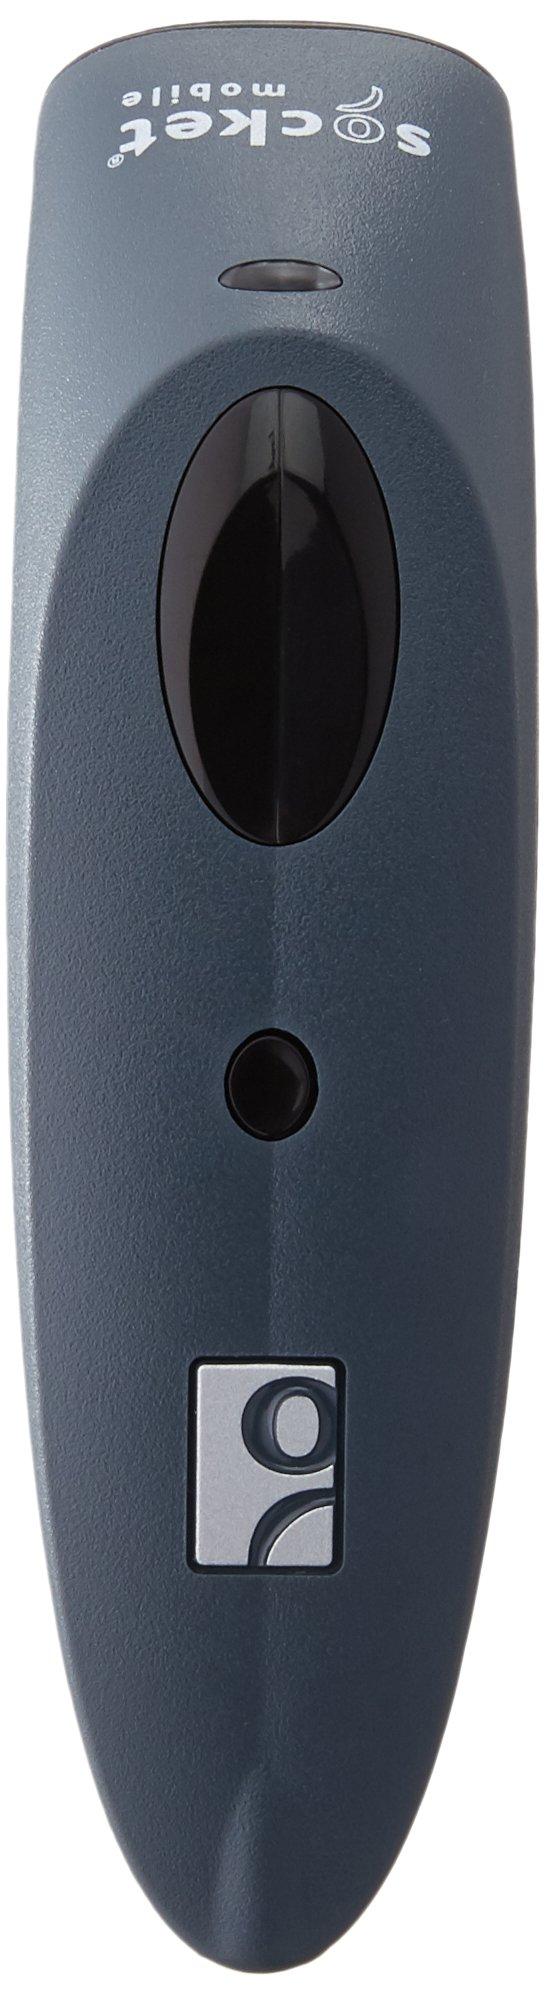 SOCKET COMMUNICATION CX2870-1409 1D BT V2 1 HID SPP VIBRATE Handheld